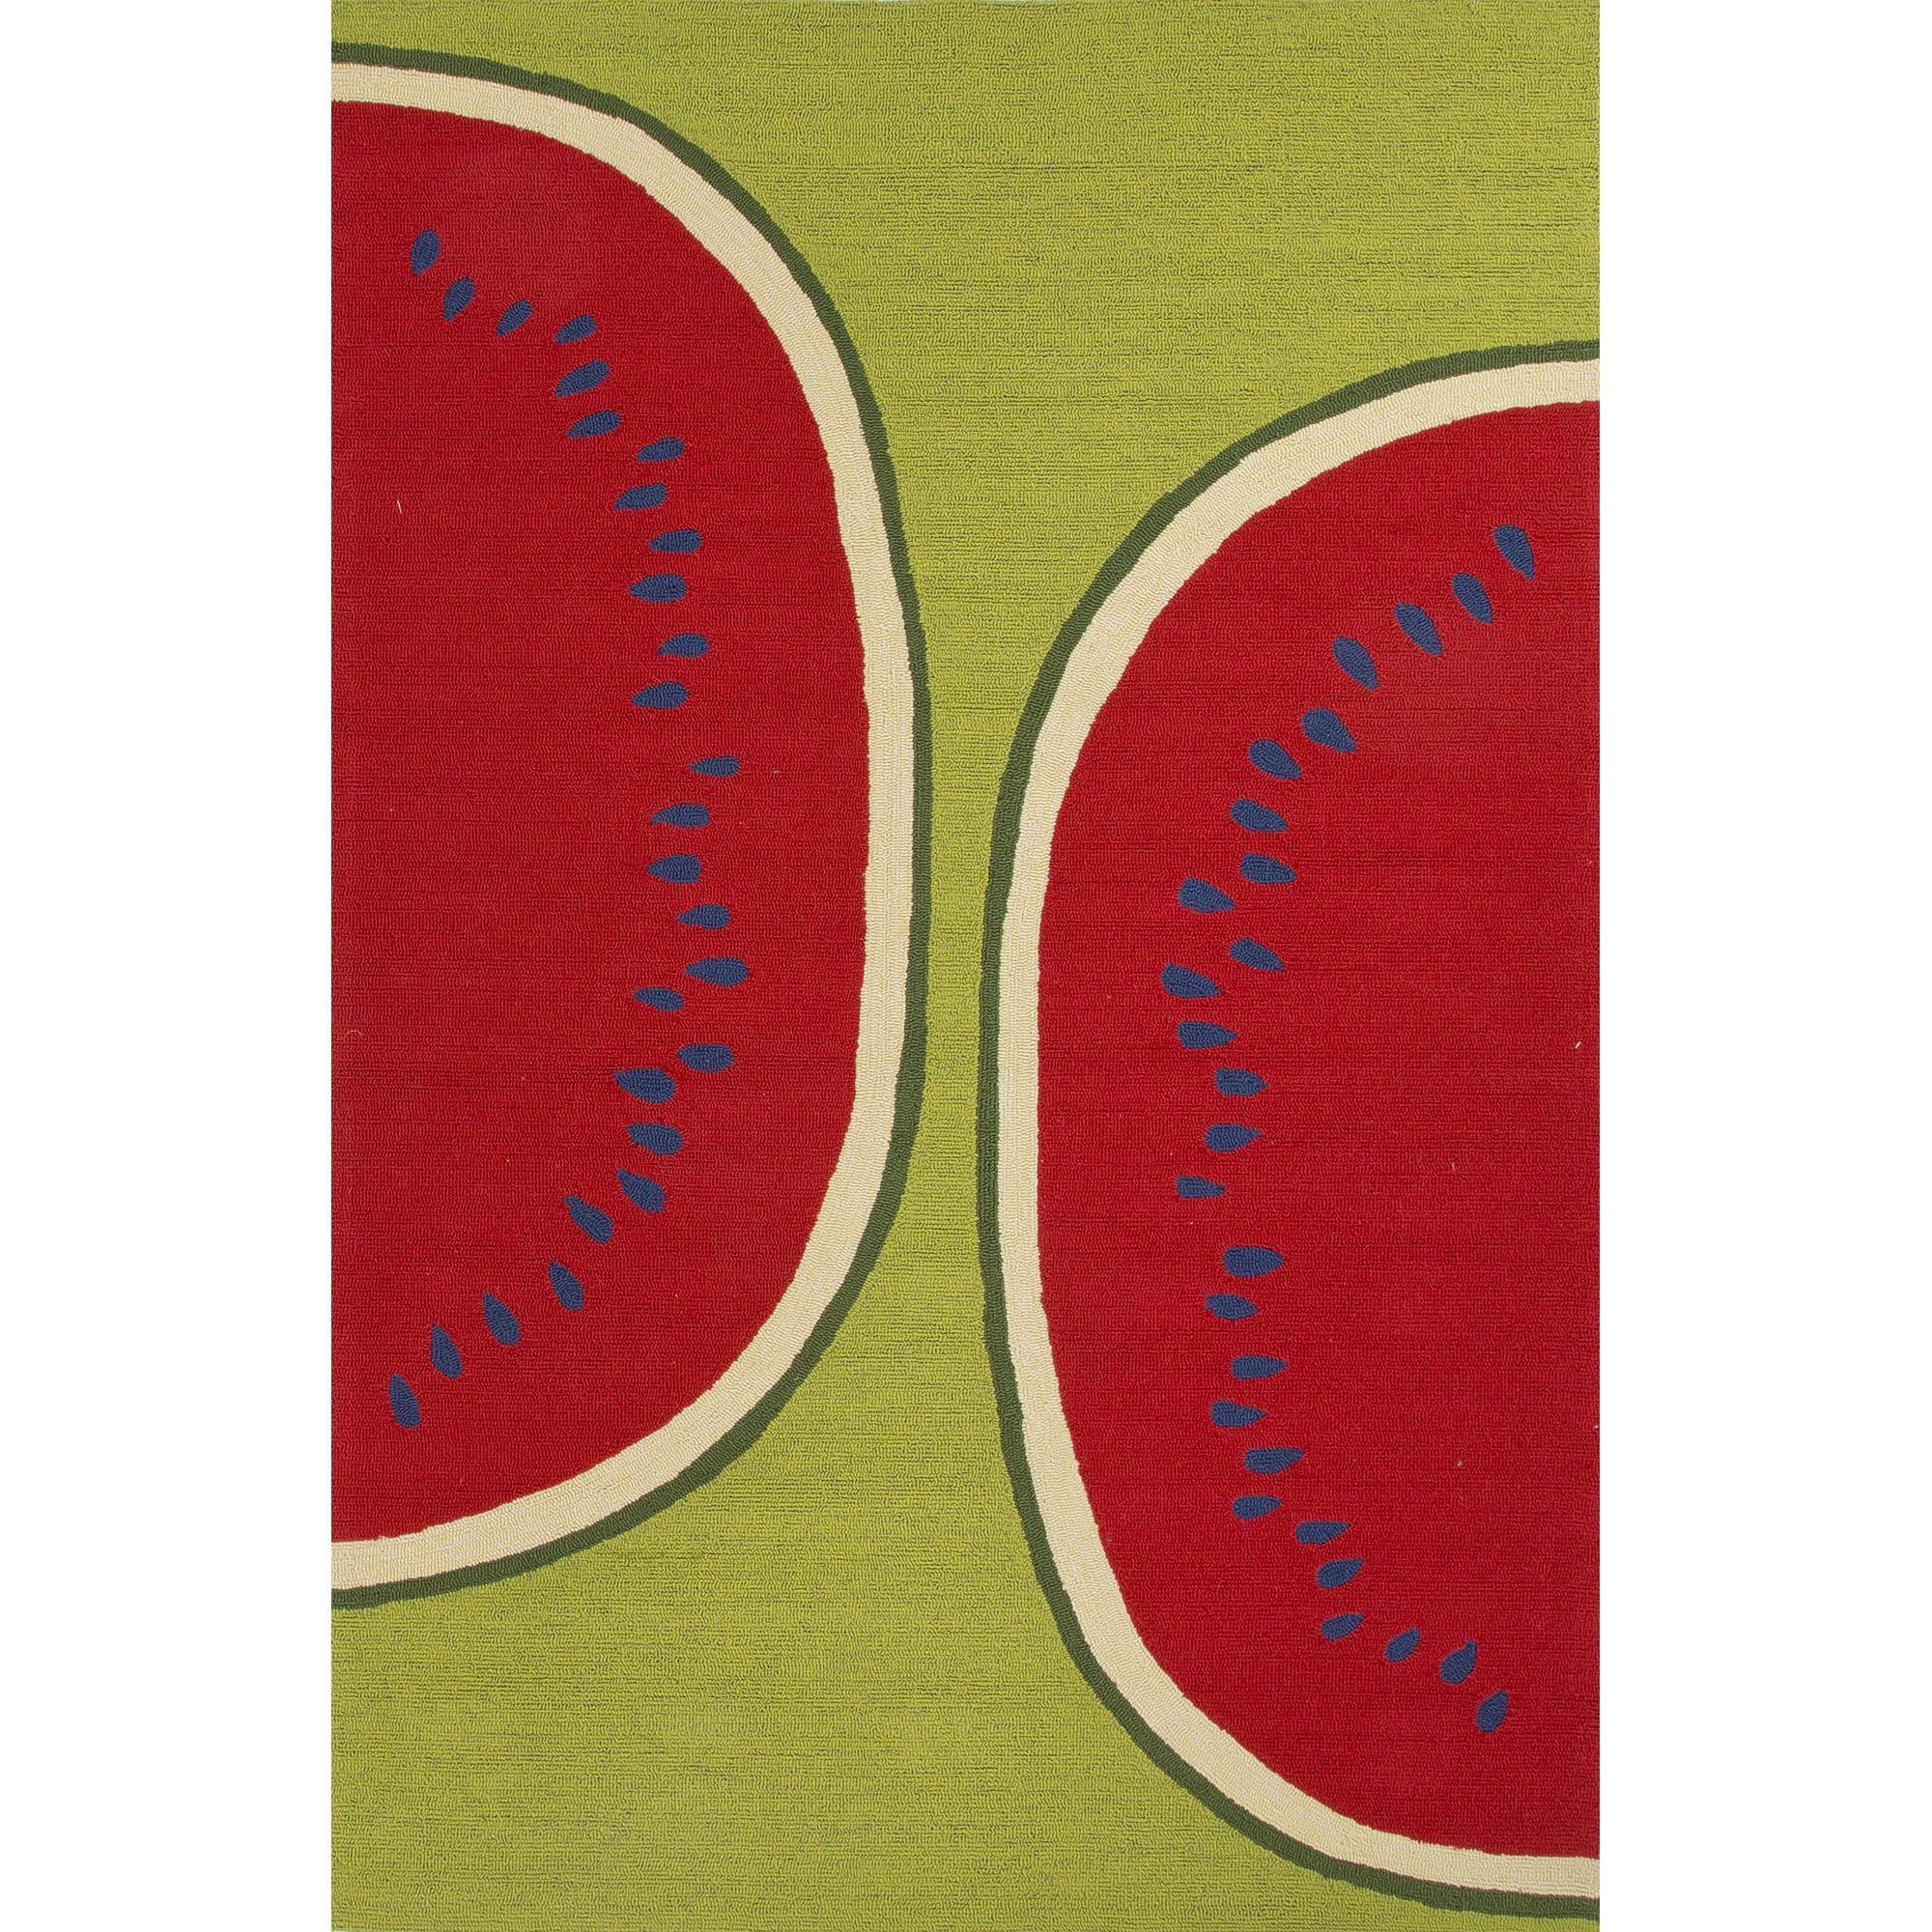 Grant I-o 3.6 x 5.6 Rug by JAIPUR Living at Jacksonville Furniture Mart